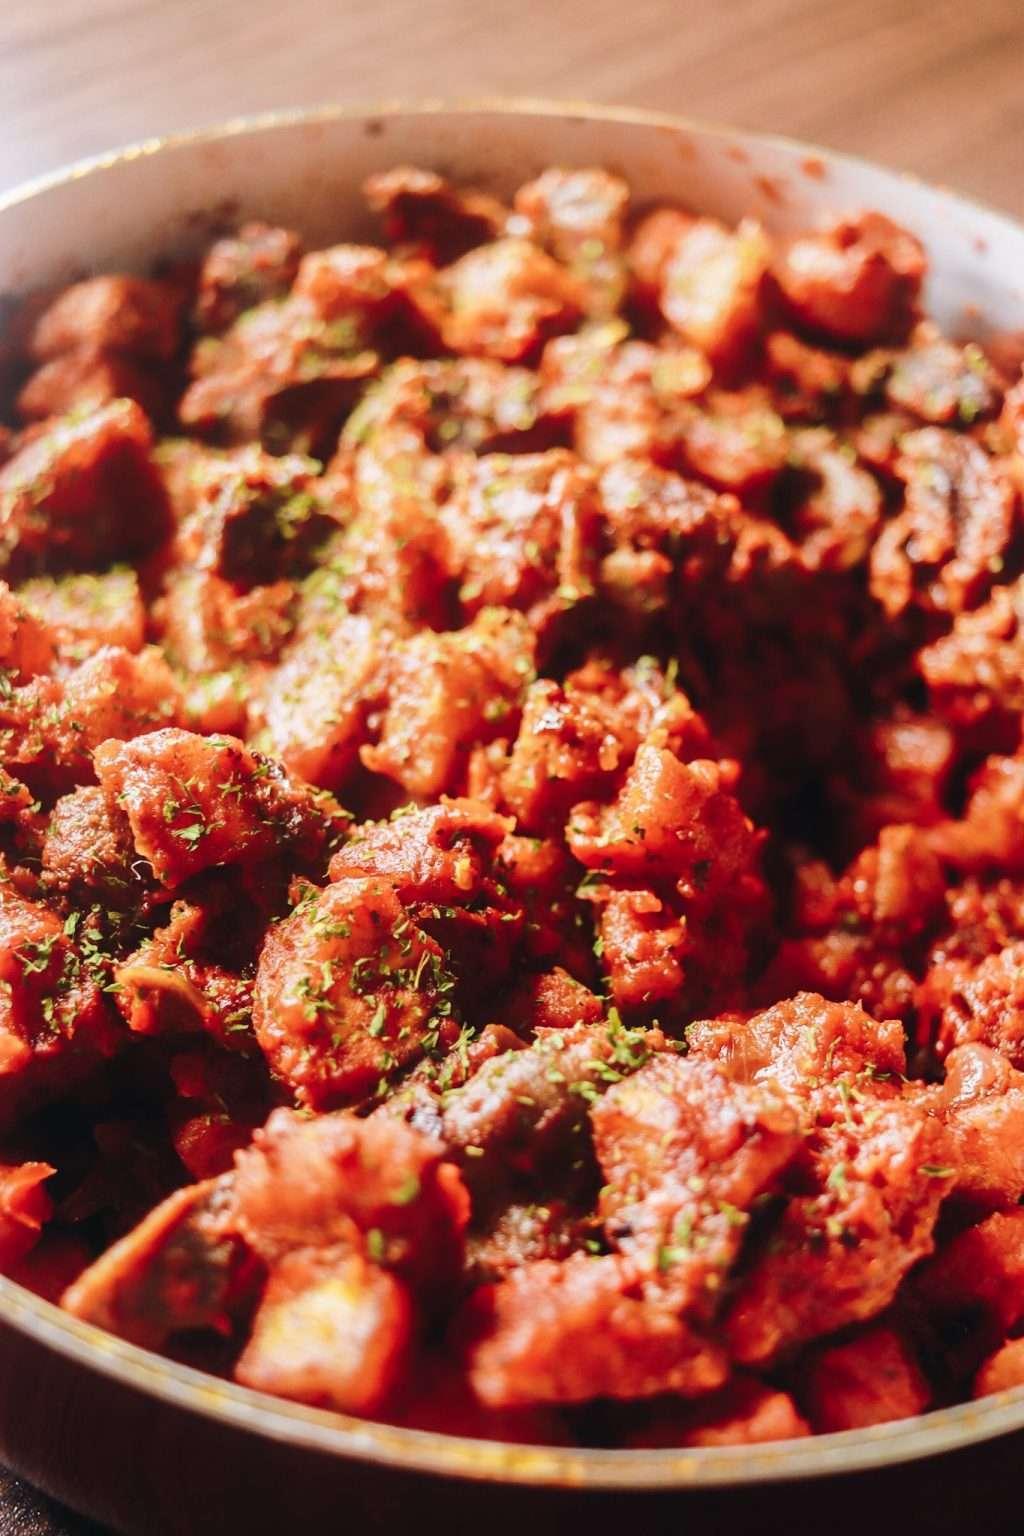 gizdodo recipe for meal 1024x1536 - Gizdodo Recipe: Gizzard and Plantain With Stew Sauce